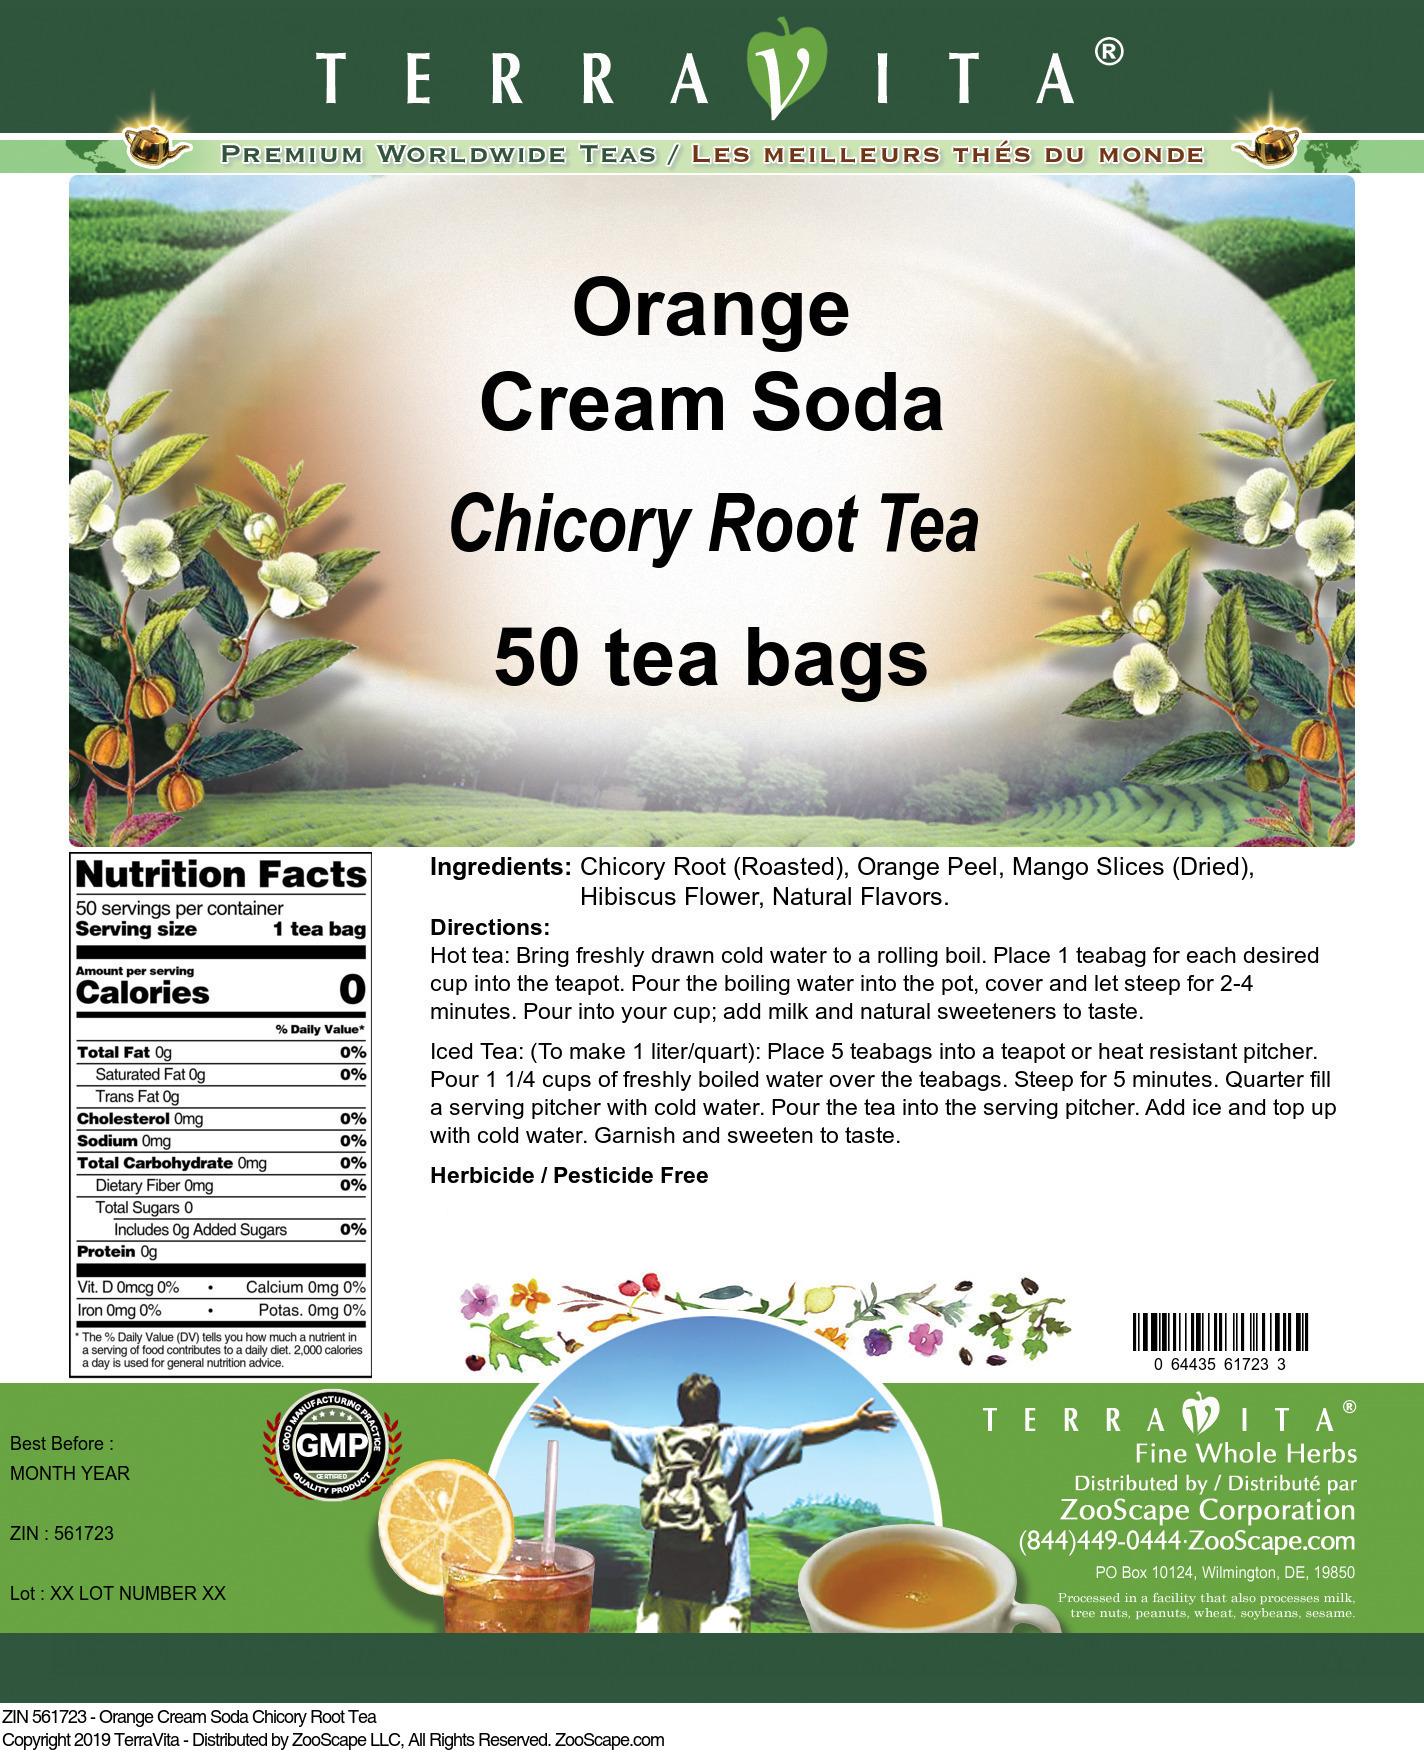 Orange Cream Soda Chicory Root Tea